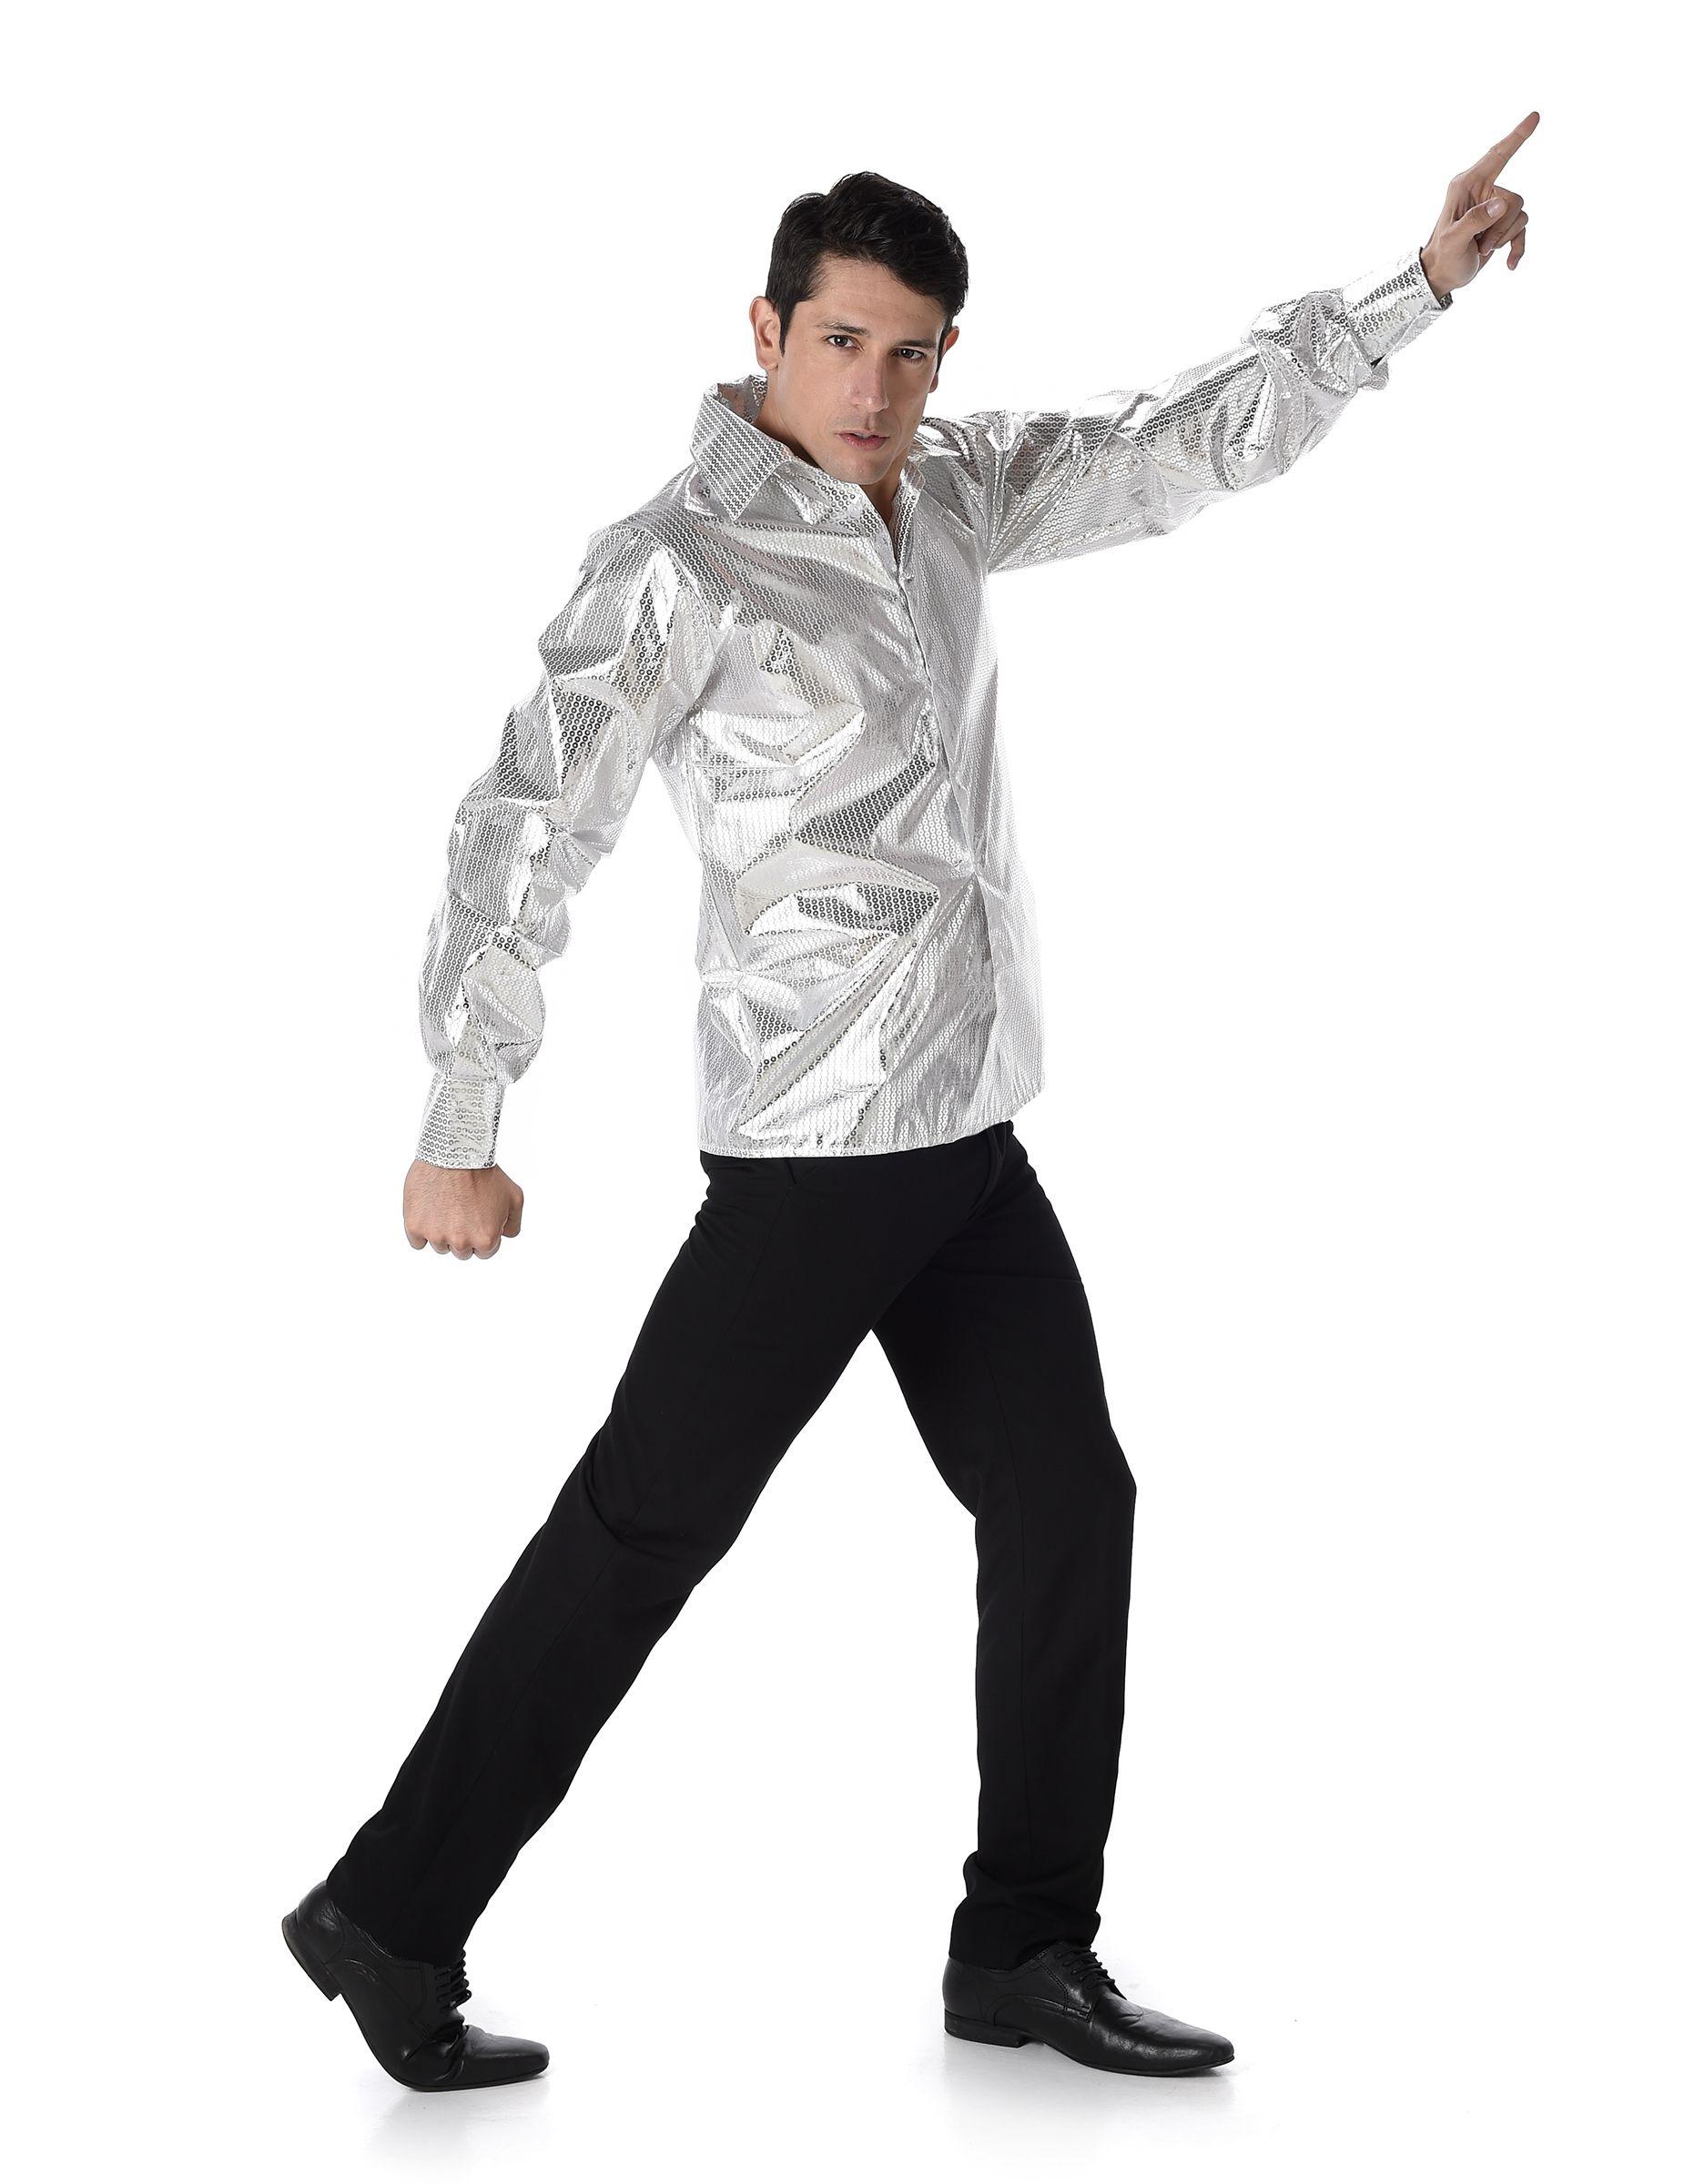 90e5210c71 Camisa disco brillante plateada hombre  Esta camisa disco es para hombre.Es  de tejido